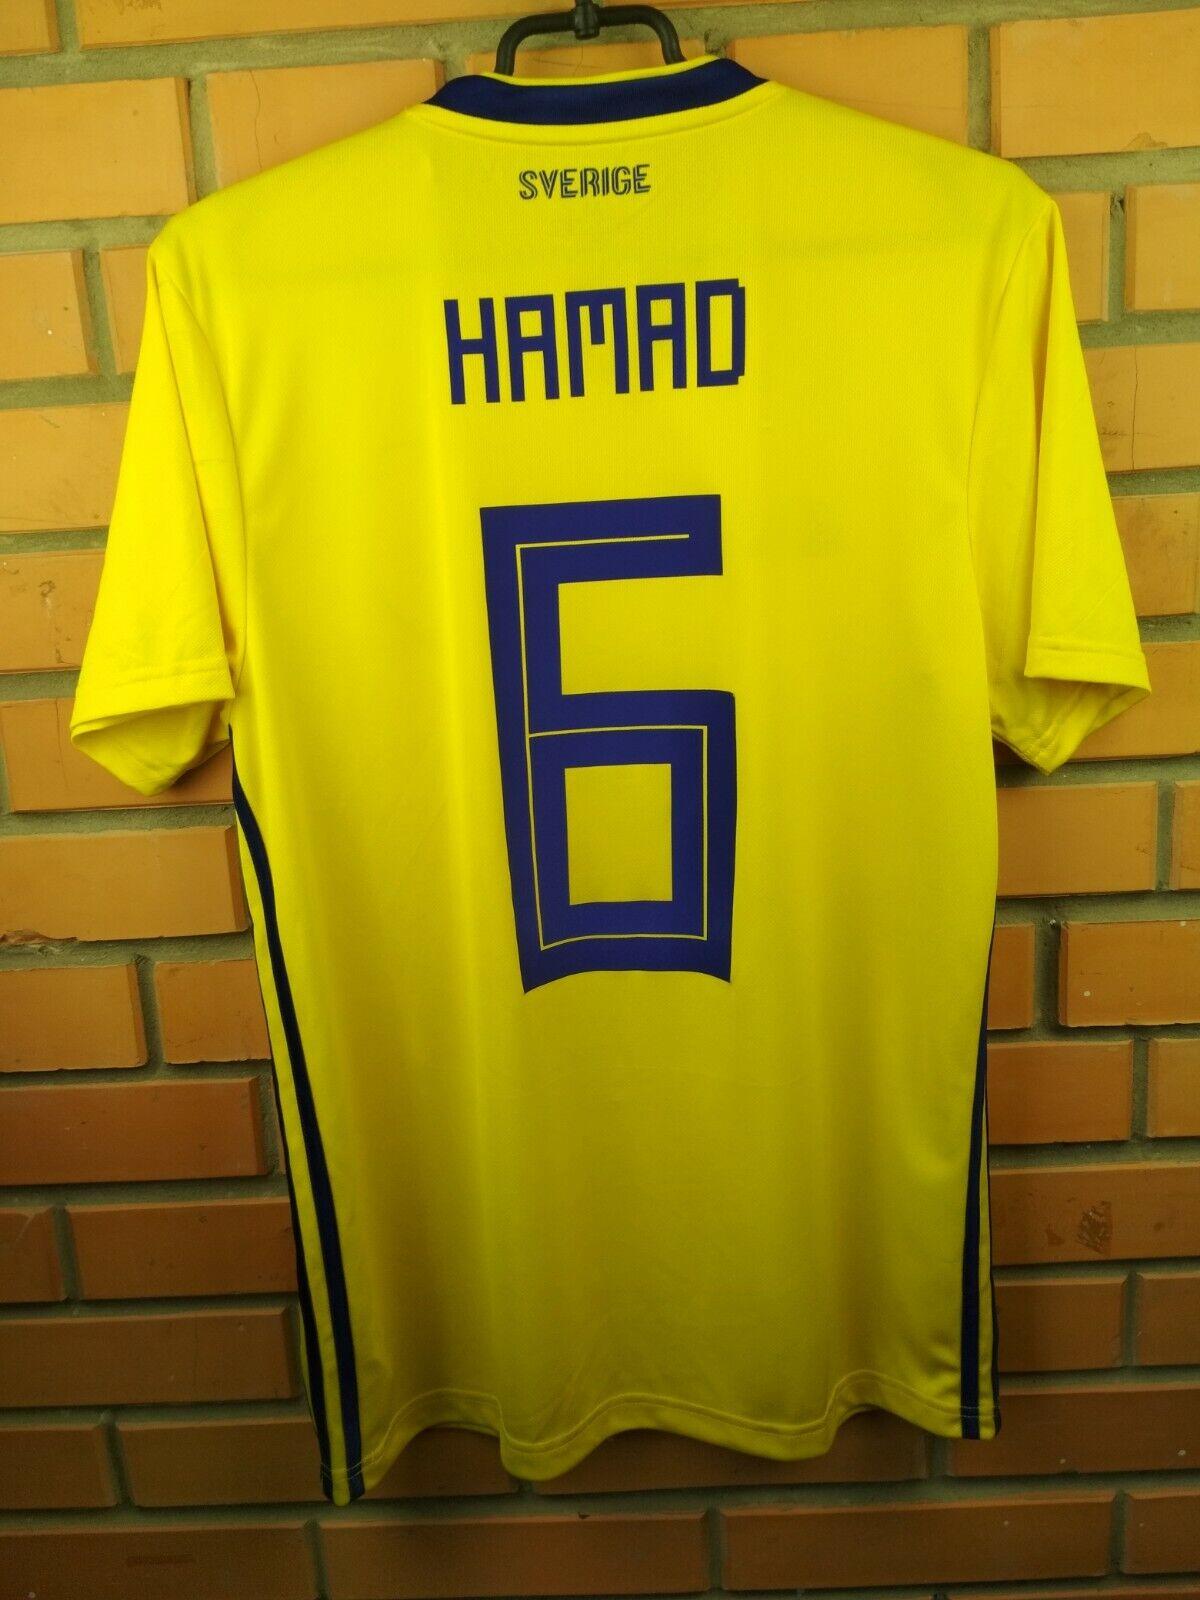 3fa25d621 Hamad Sweden soccer 2019 home shirt BR3838 football Adidas jersey medium  nvzmvf2295-Soccer-National Teams